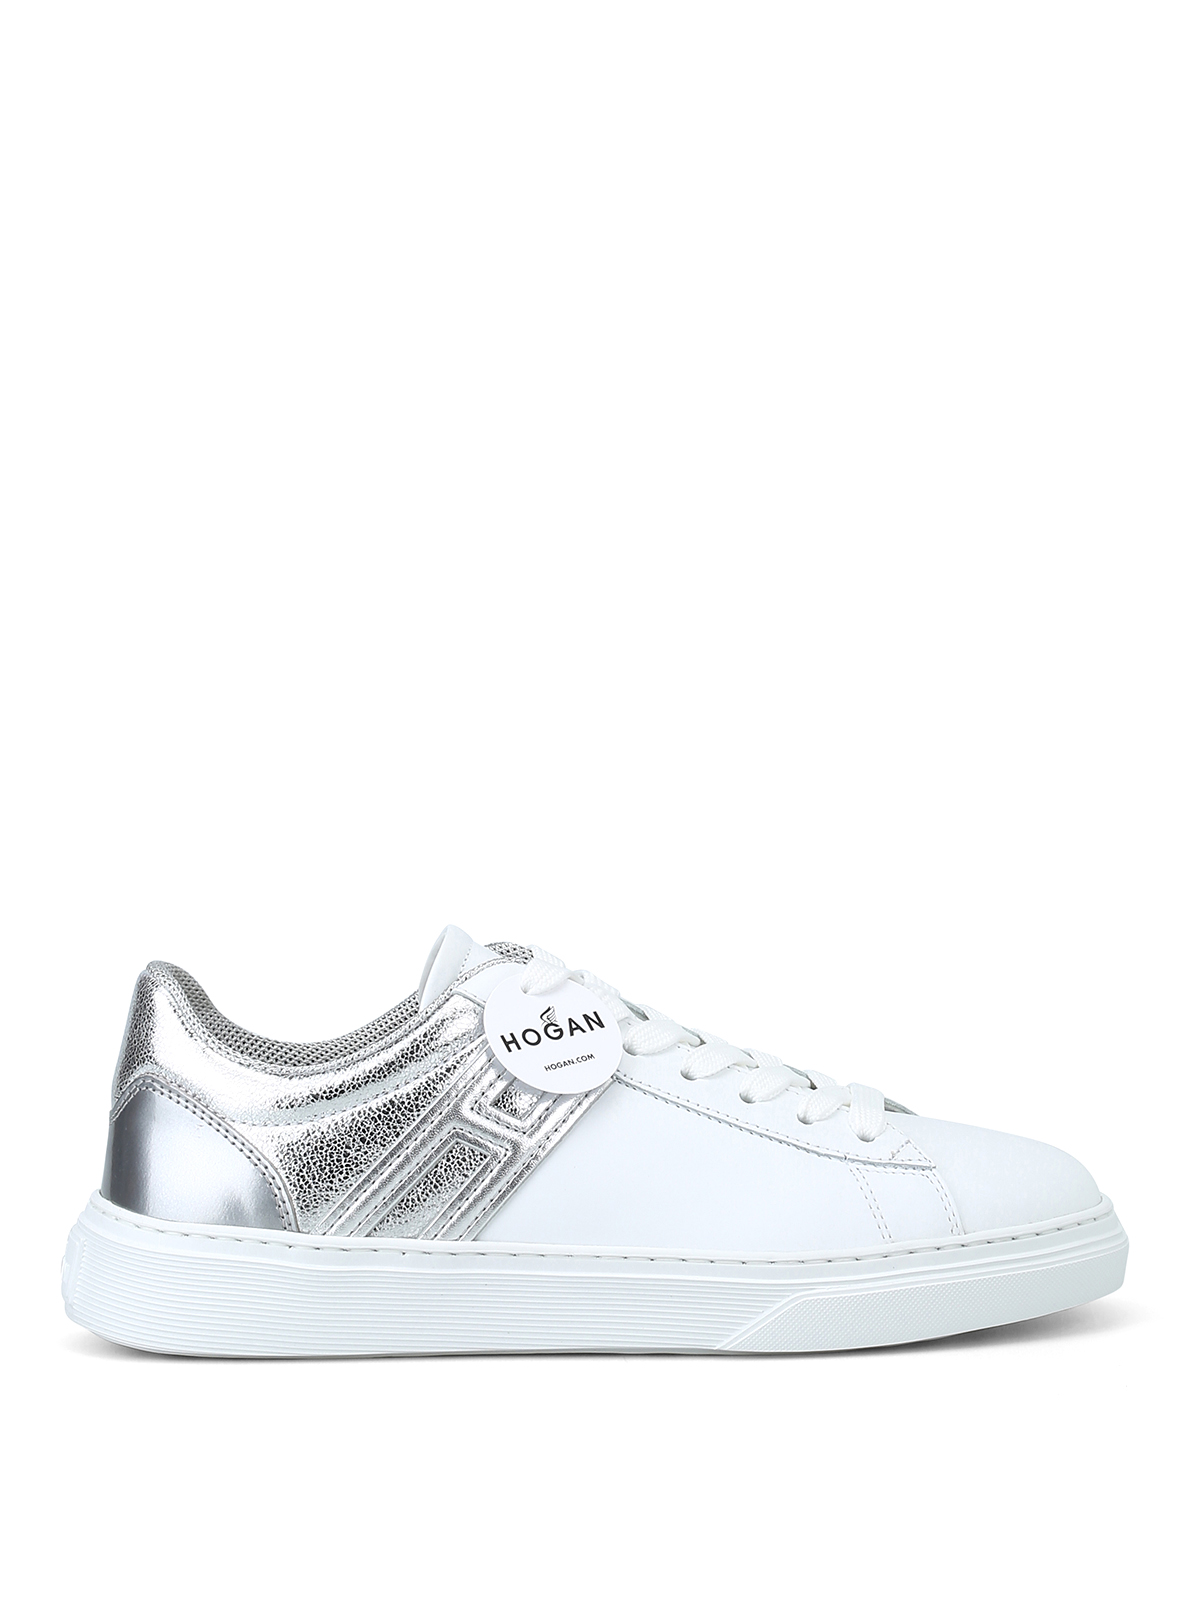 855139b97f794 Hogan - Sneaker H365 bianche e argento - sneakers - HXW3650J971JCU0351